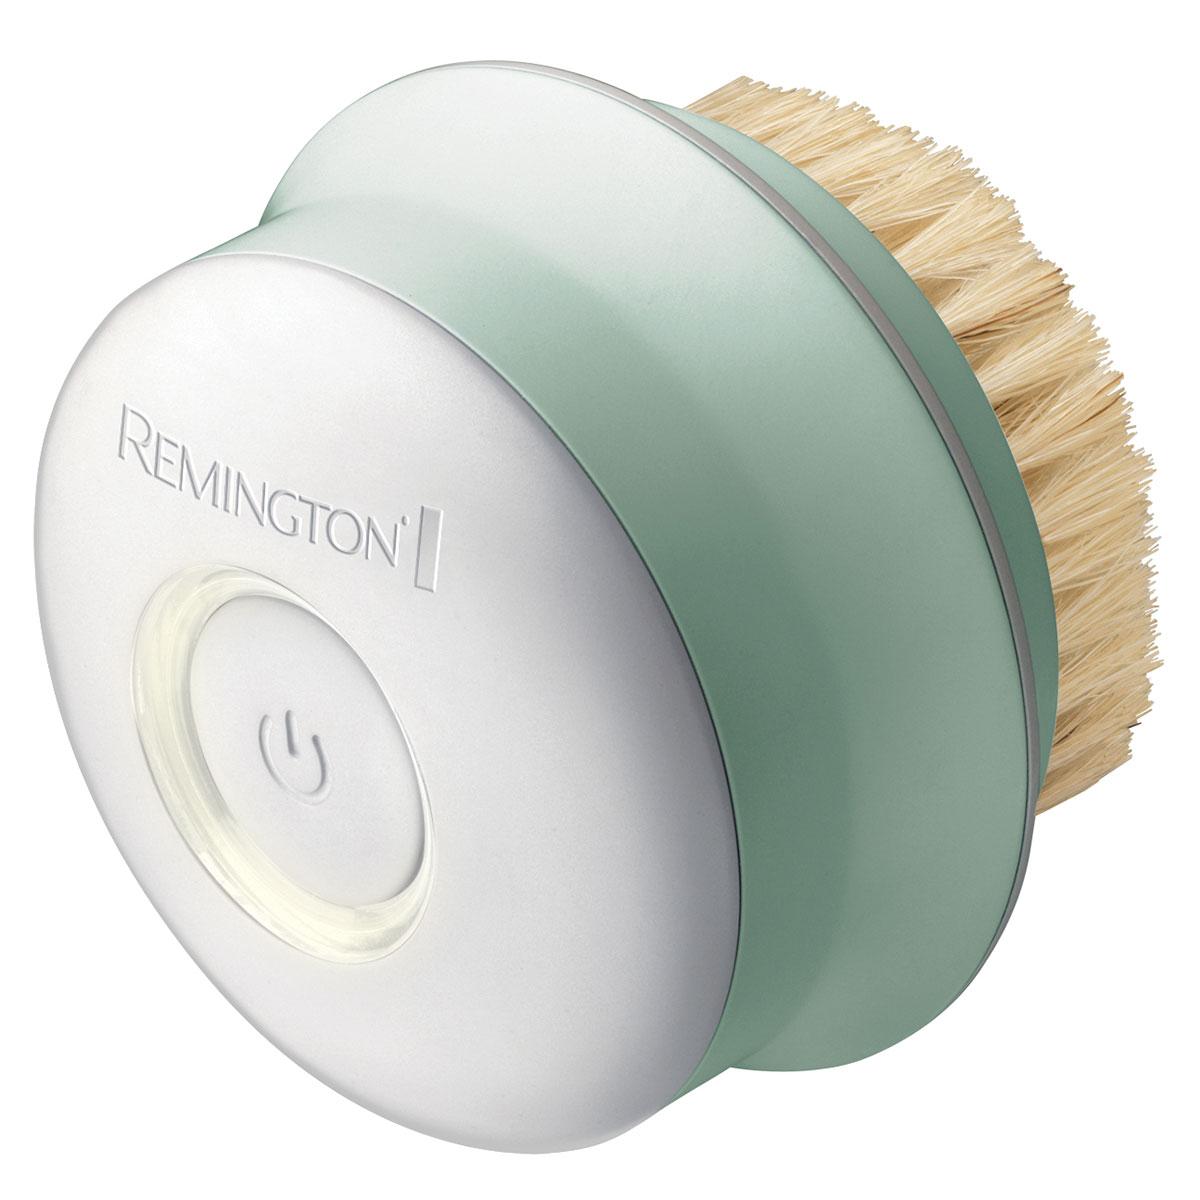 Remington Revale Body Brush